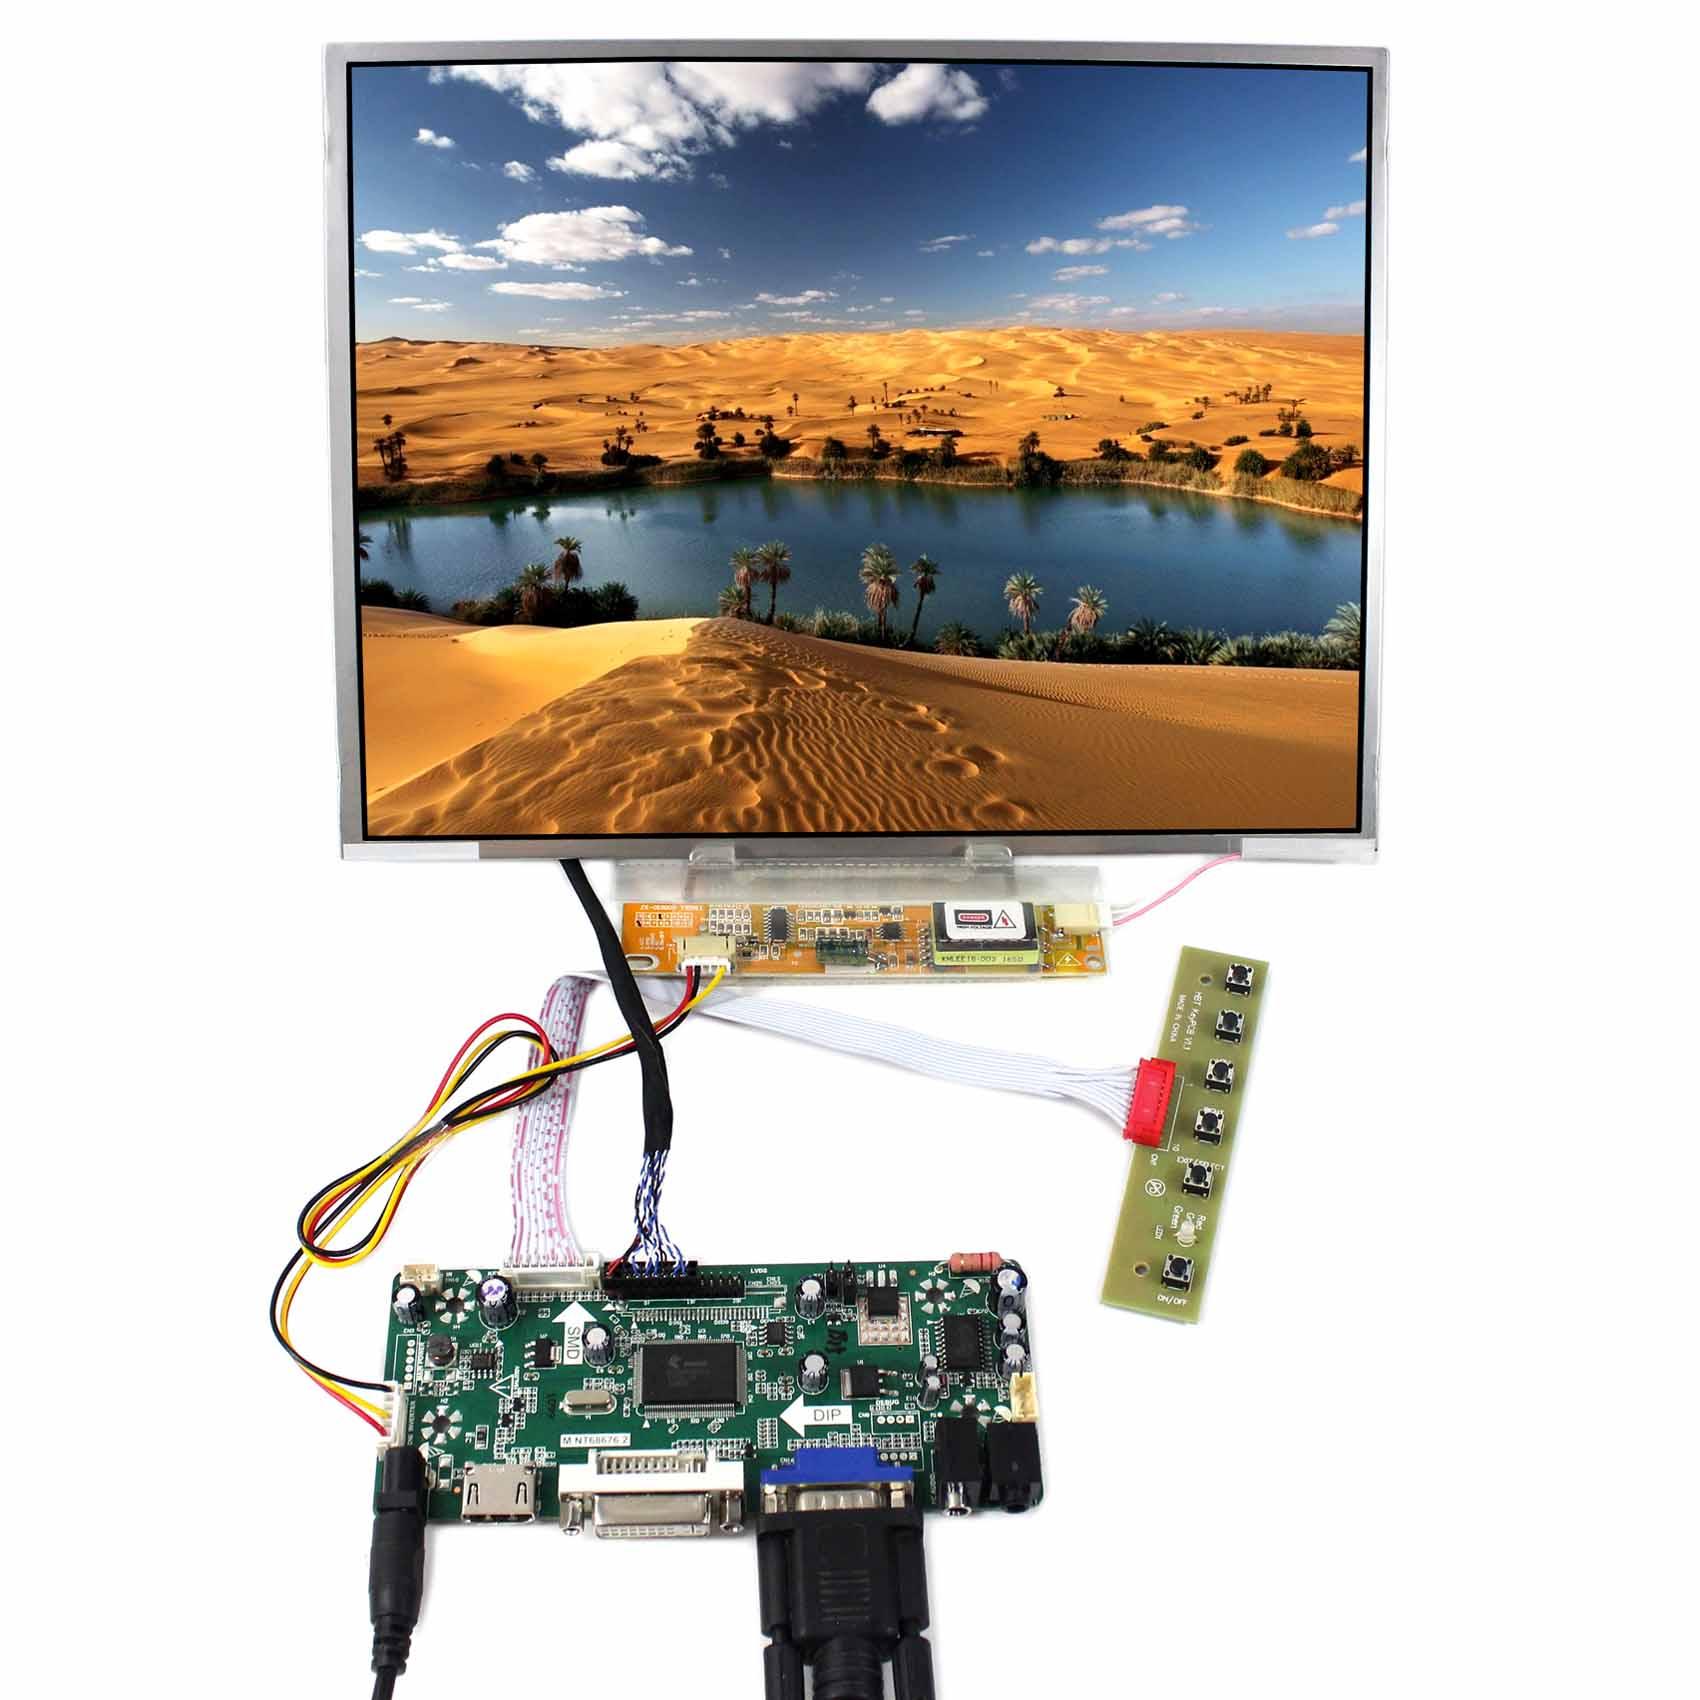 HDMI DVI VGA LCD Controller Board 12.1inch 1024x768 N121X5 LTN121XT HT121X01 LCD Panel стоимость